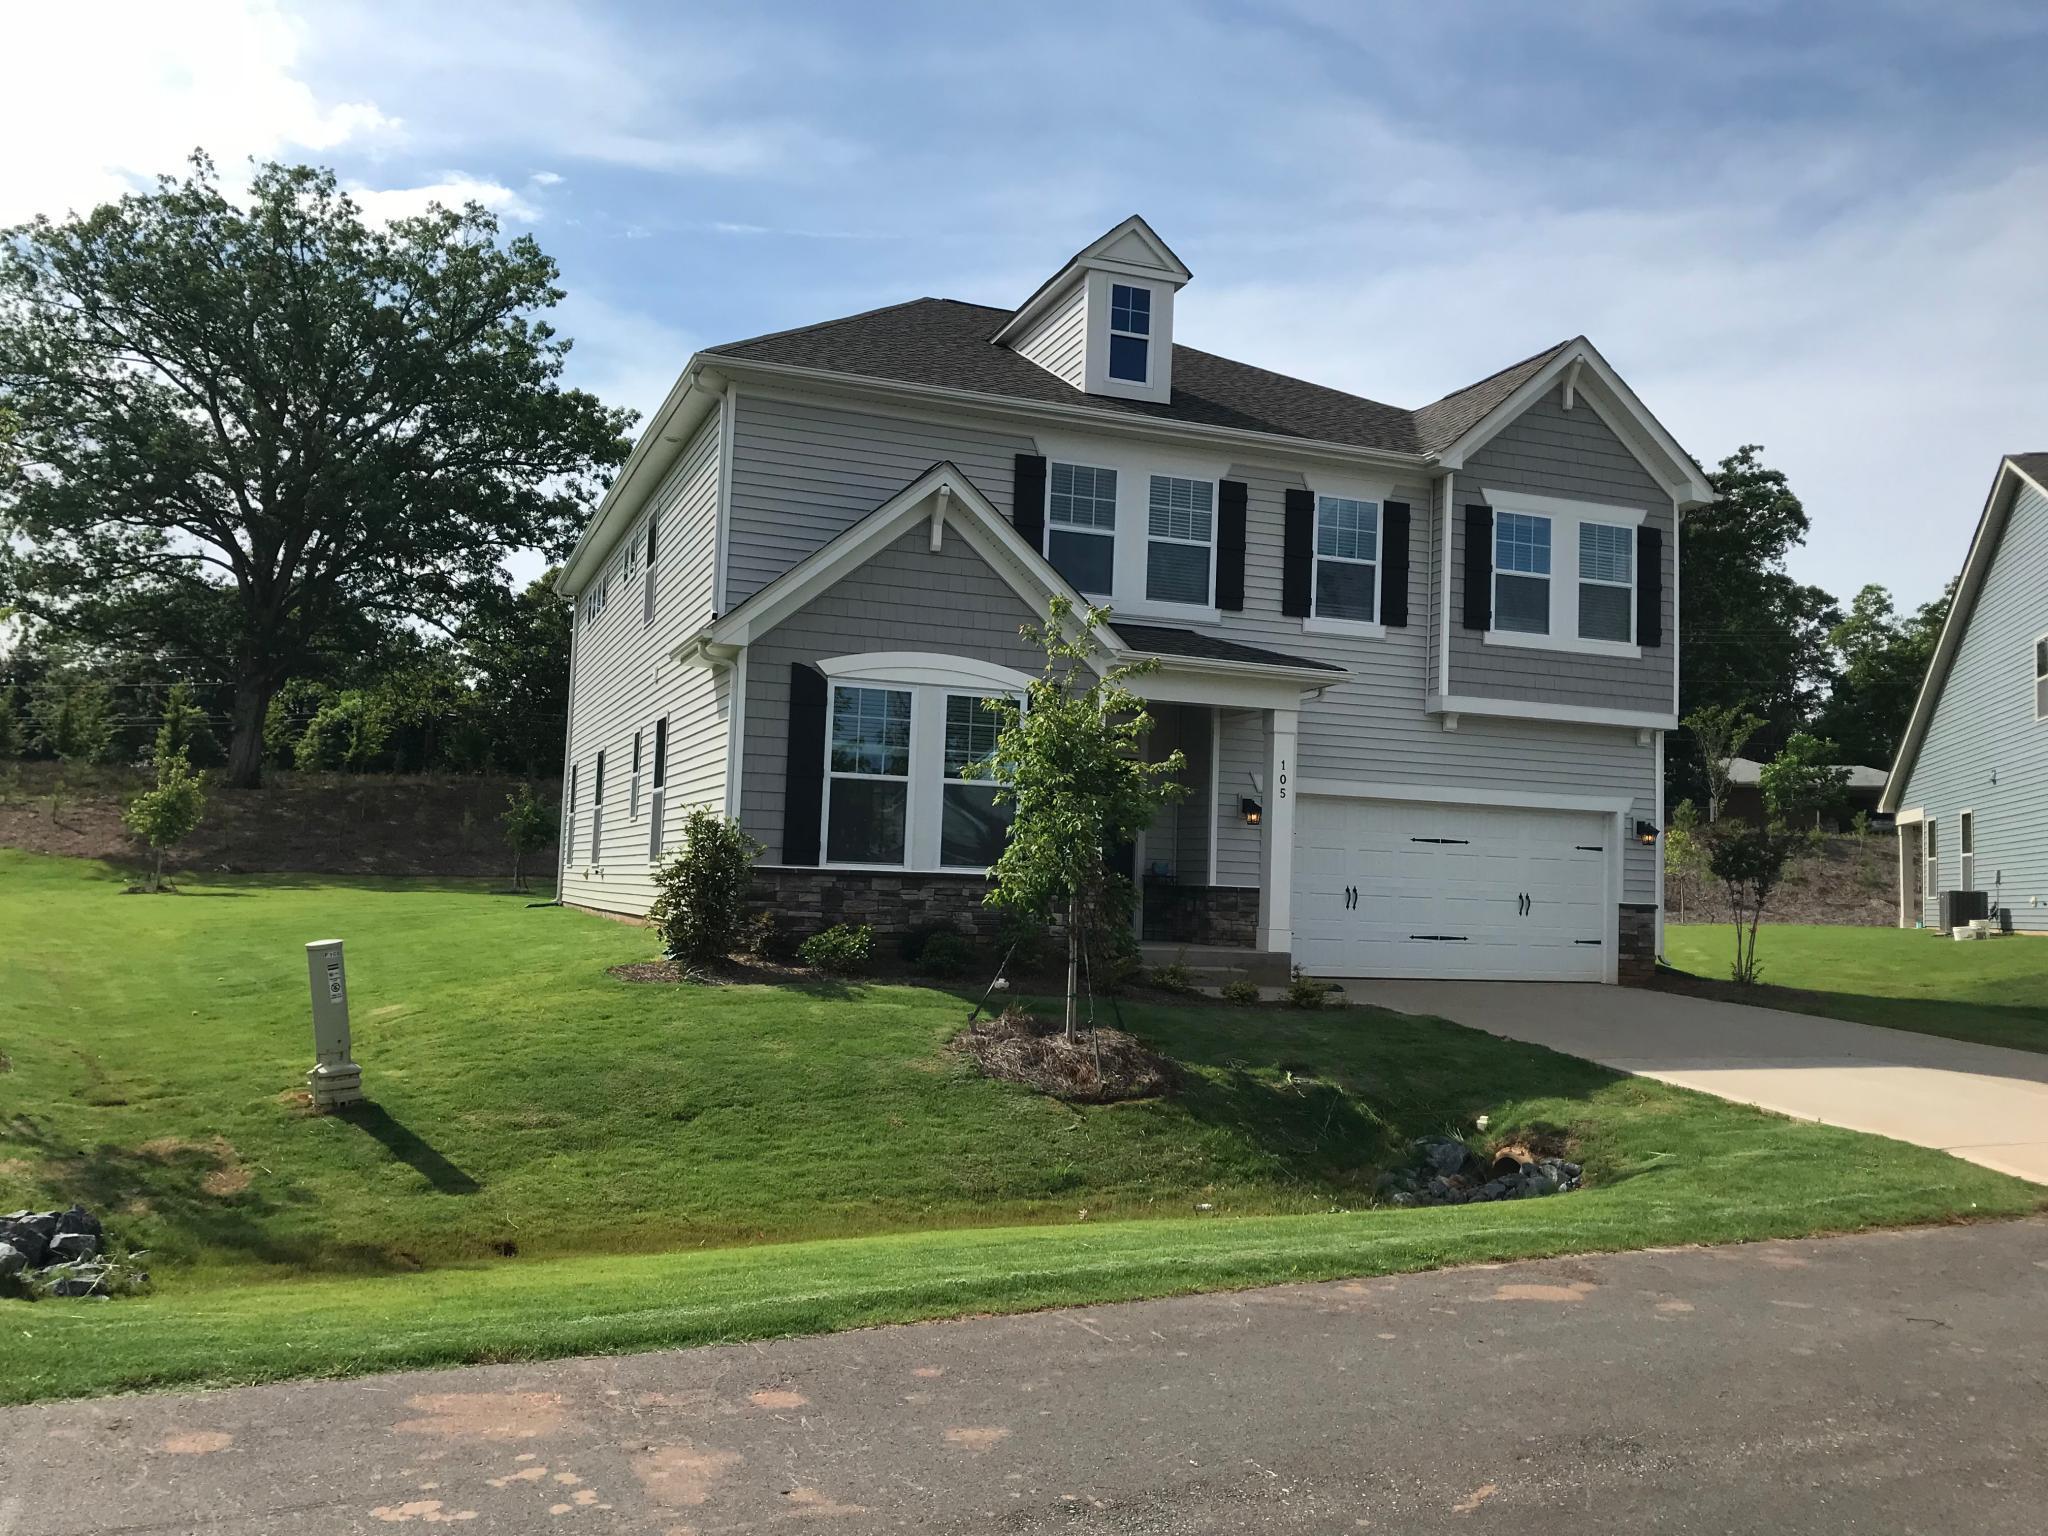 105 Serenade Ct, Belmont, NC 28012 For Rent | Trulia